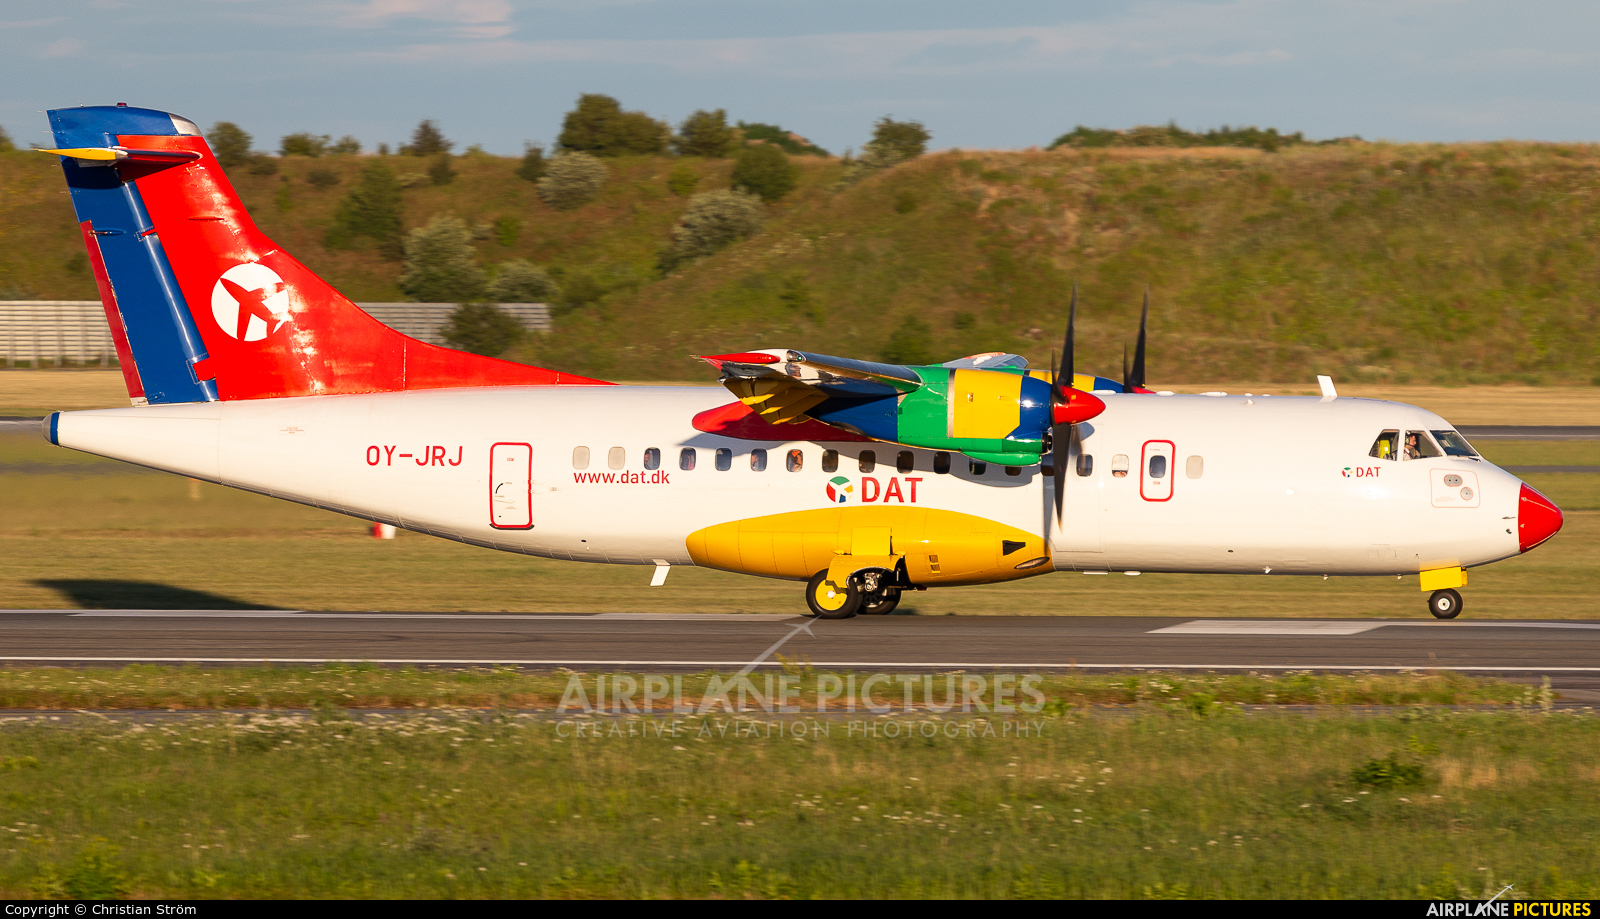 Danish Air Transport OY-JRJ aircraft at Copenhagen Kastrup